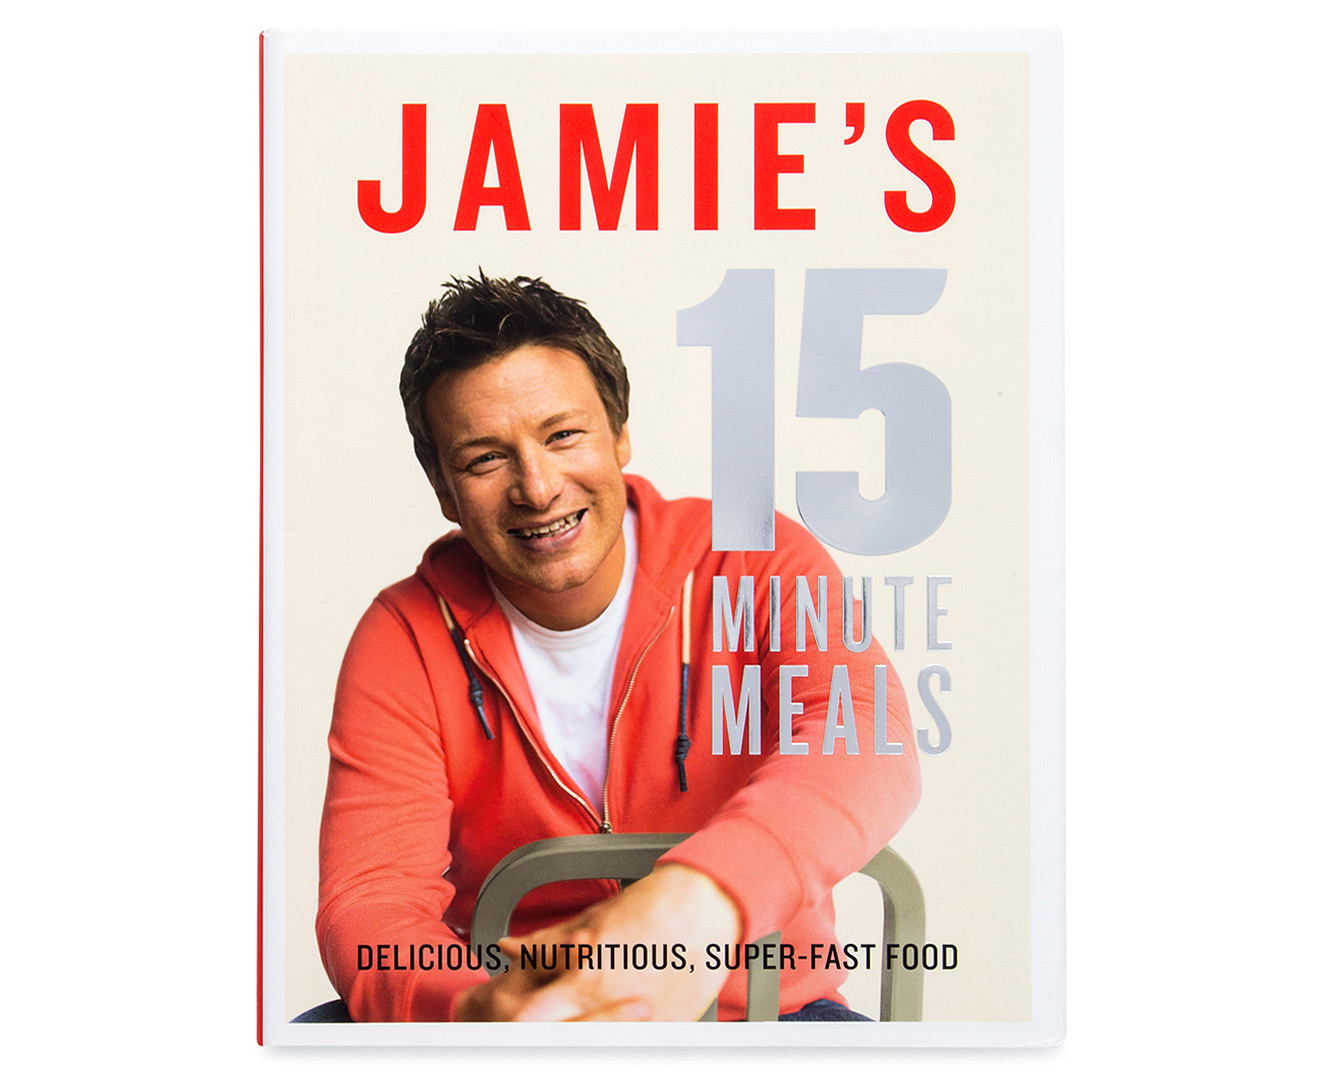 Jamie oliver 39 s 15 minute meals cookbook great daily deals at australia 39 s favourite superstore - Jamie en 15 minutes ...